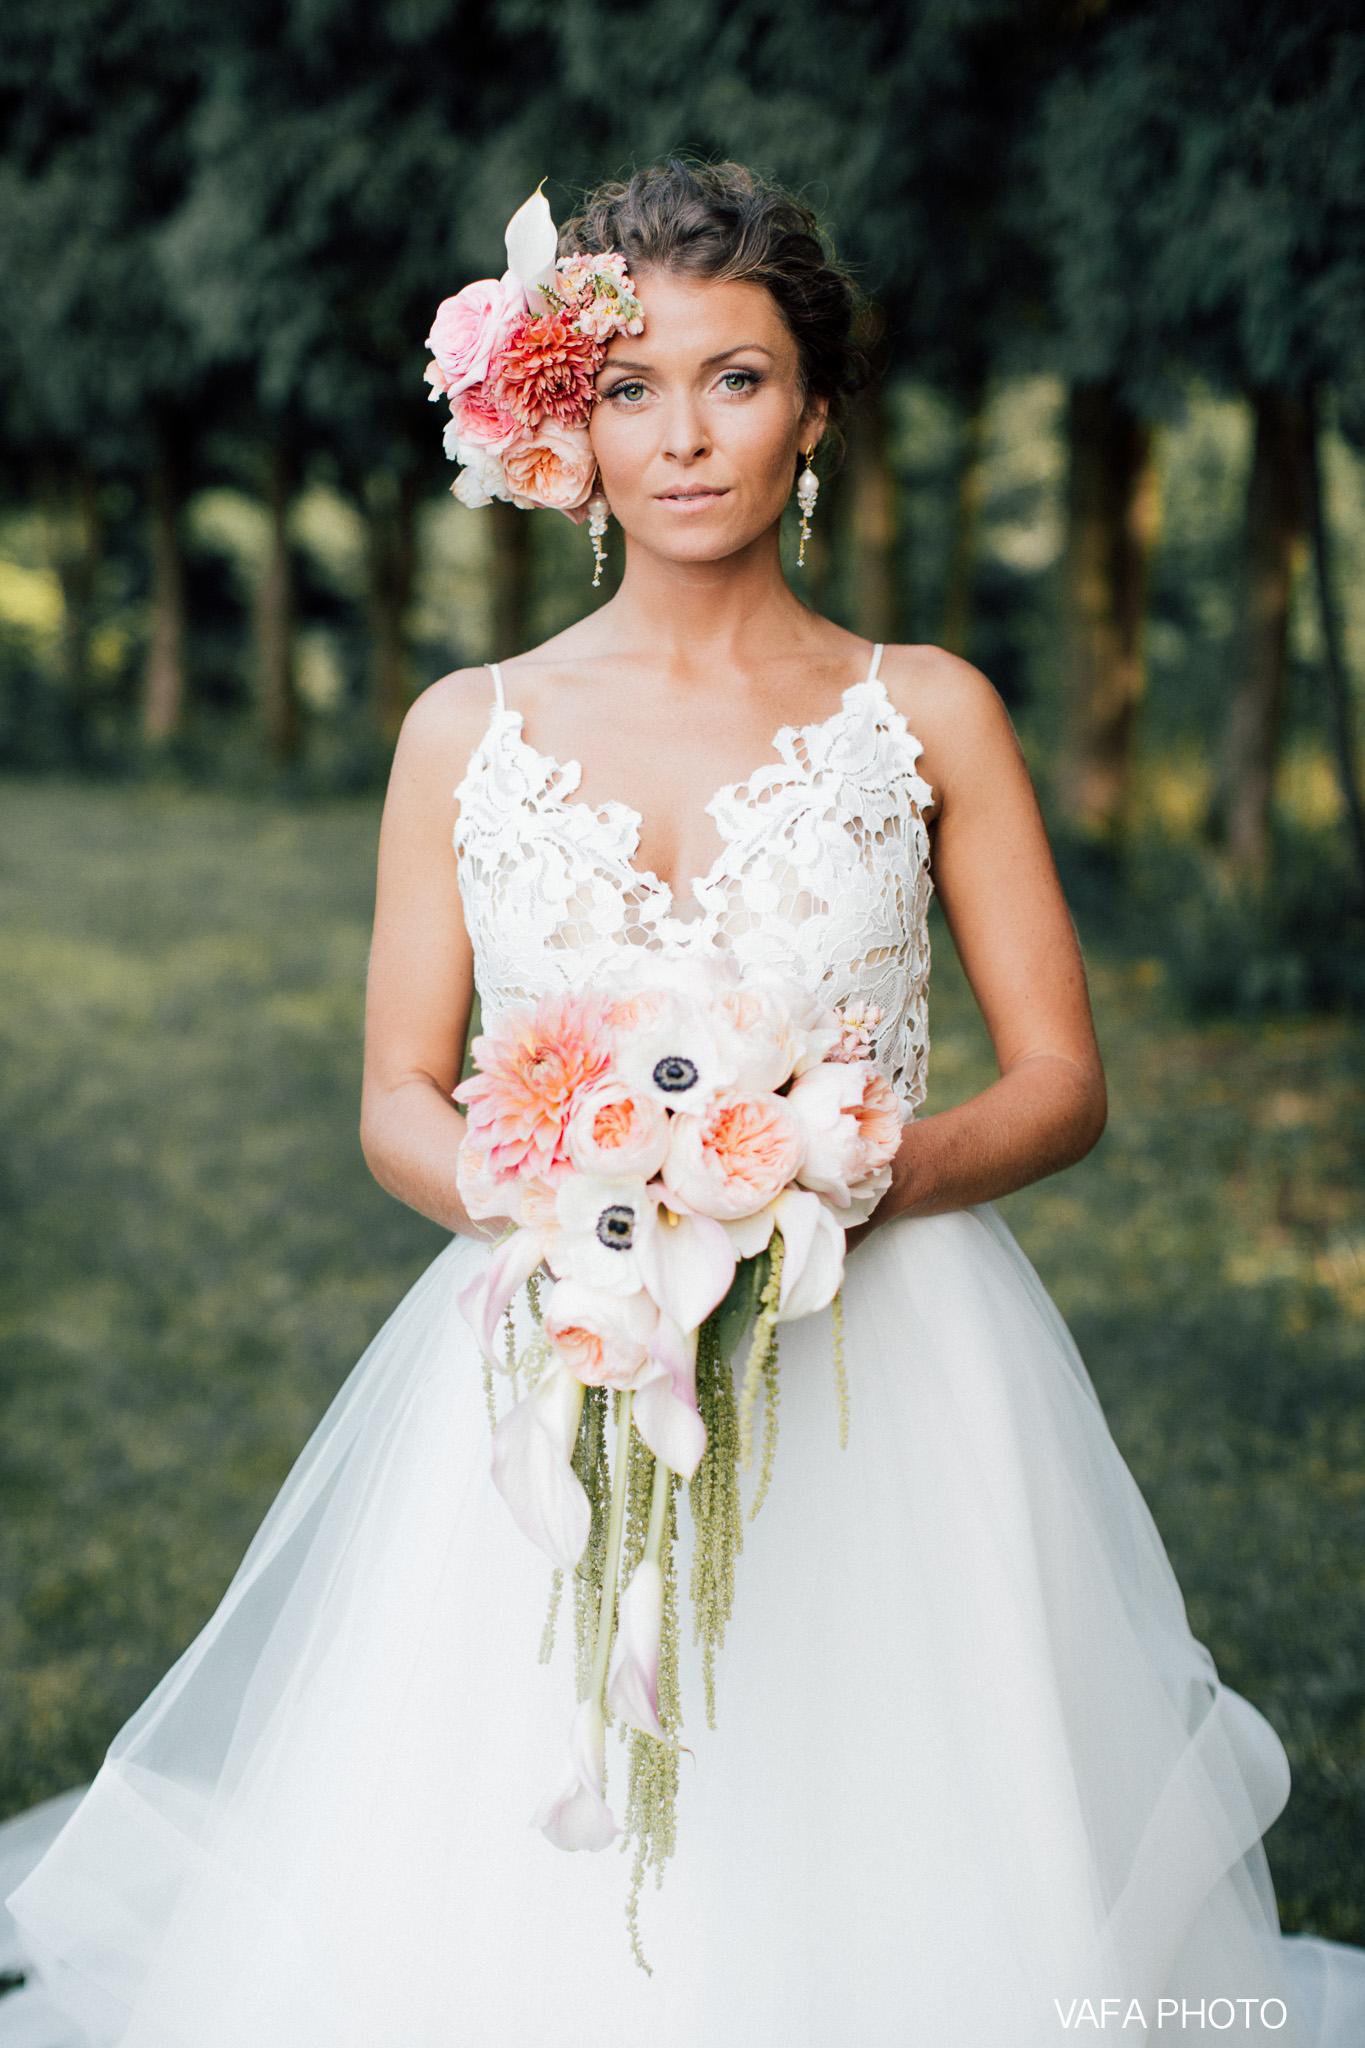 The-Felt-Estate-Wedding-Kailie-David-Vafa-Photo-708.jpg